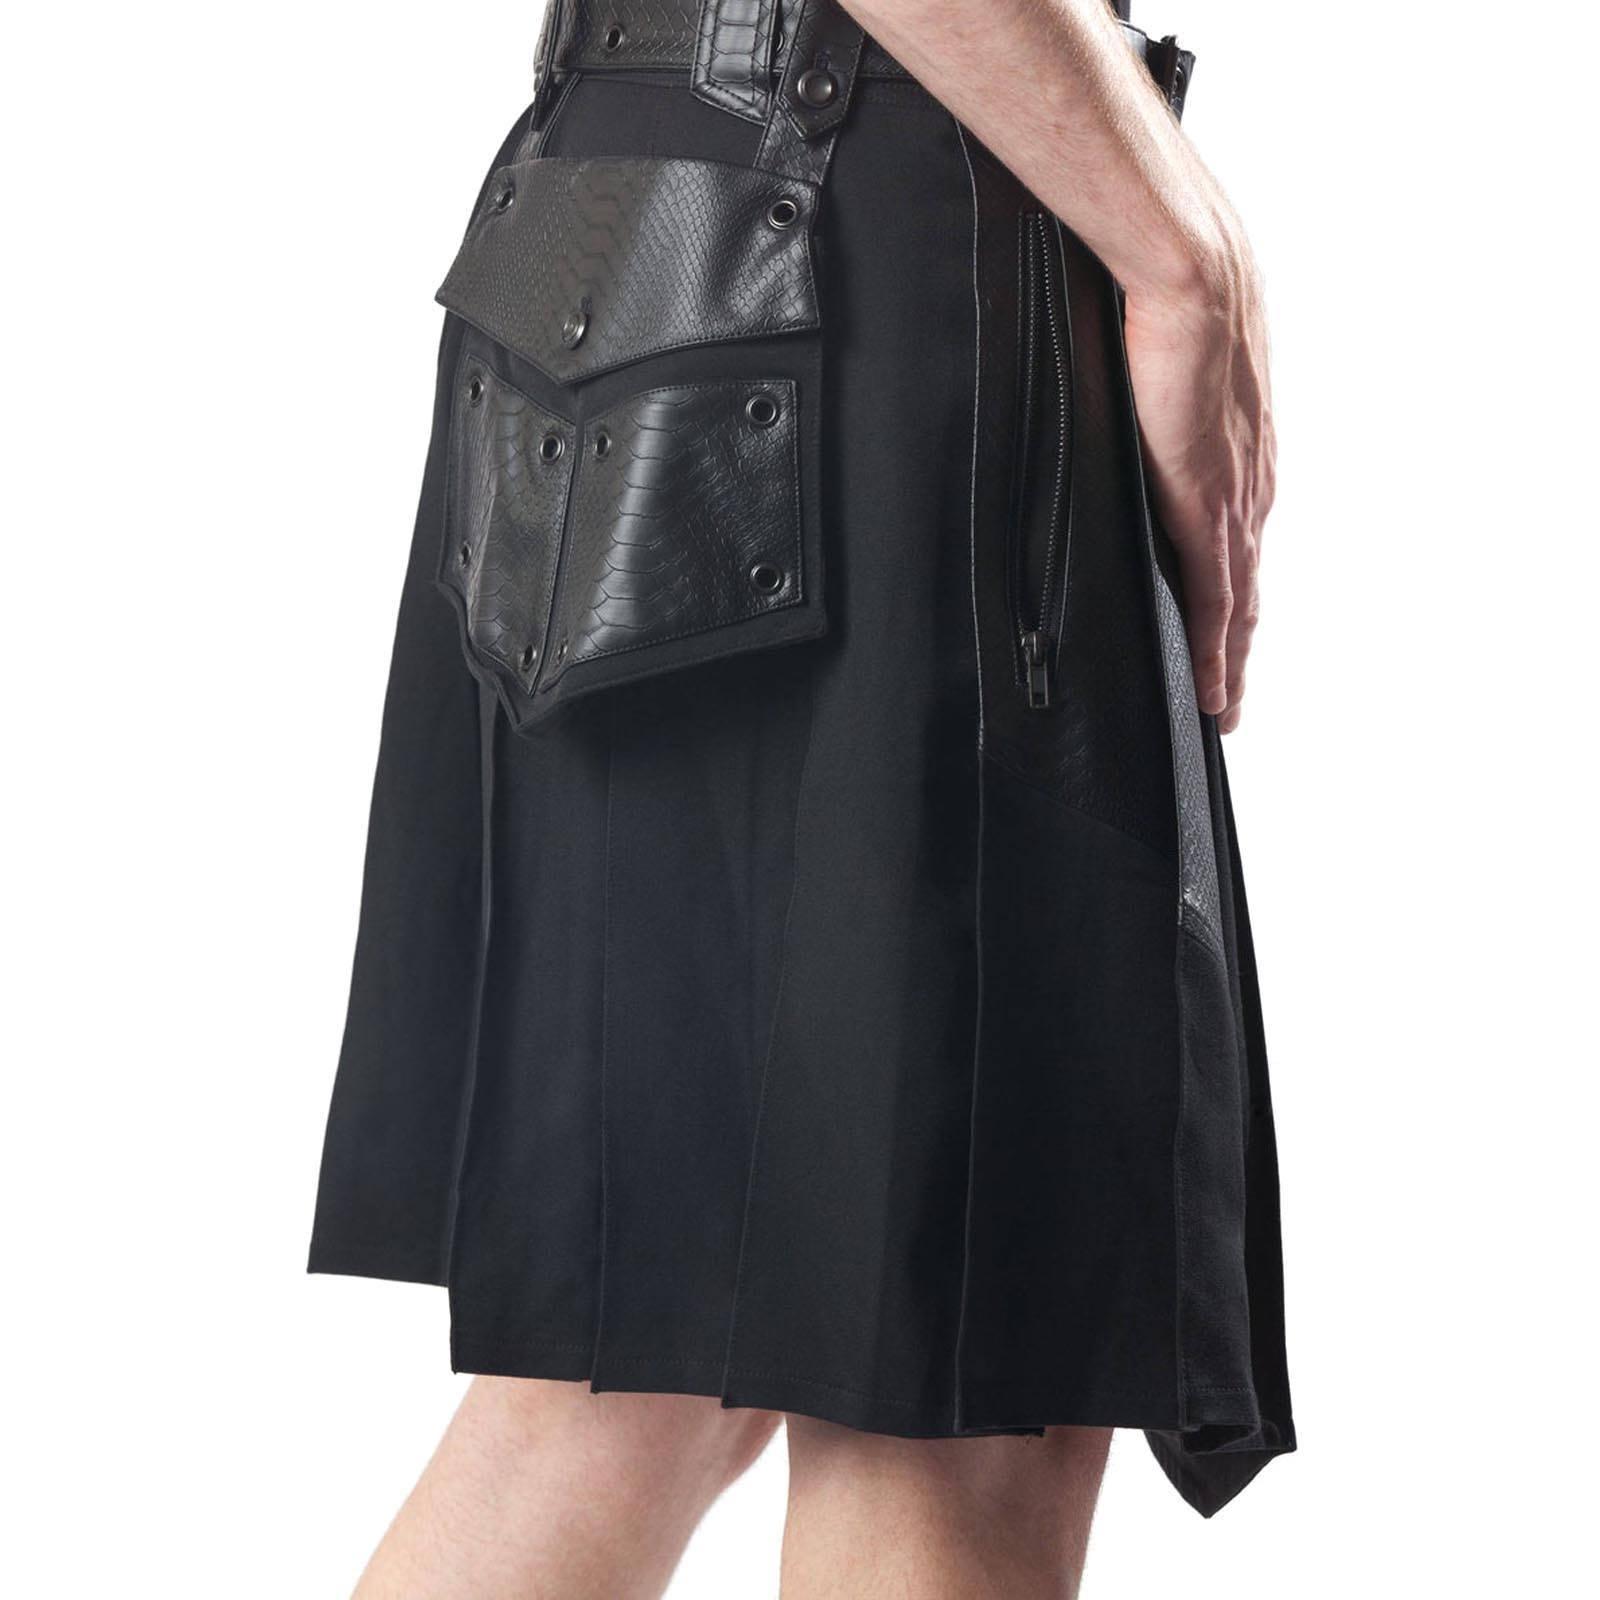 Leather Patch Gothic Kilt